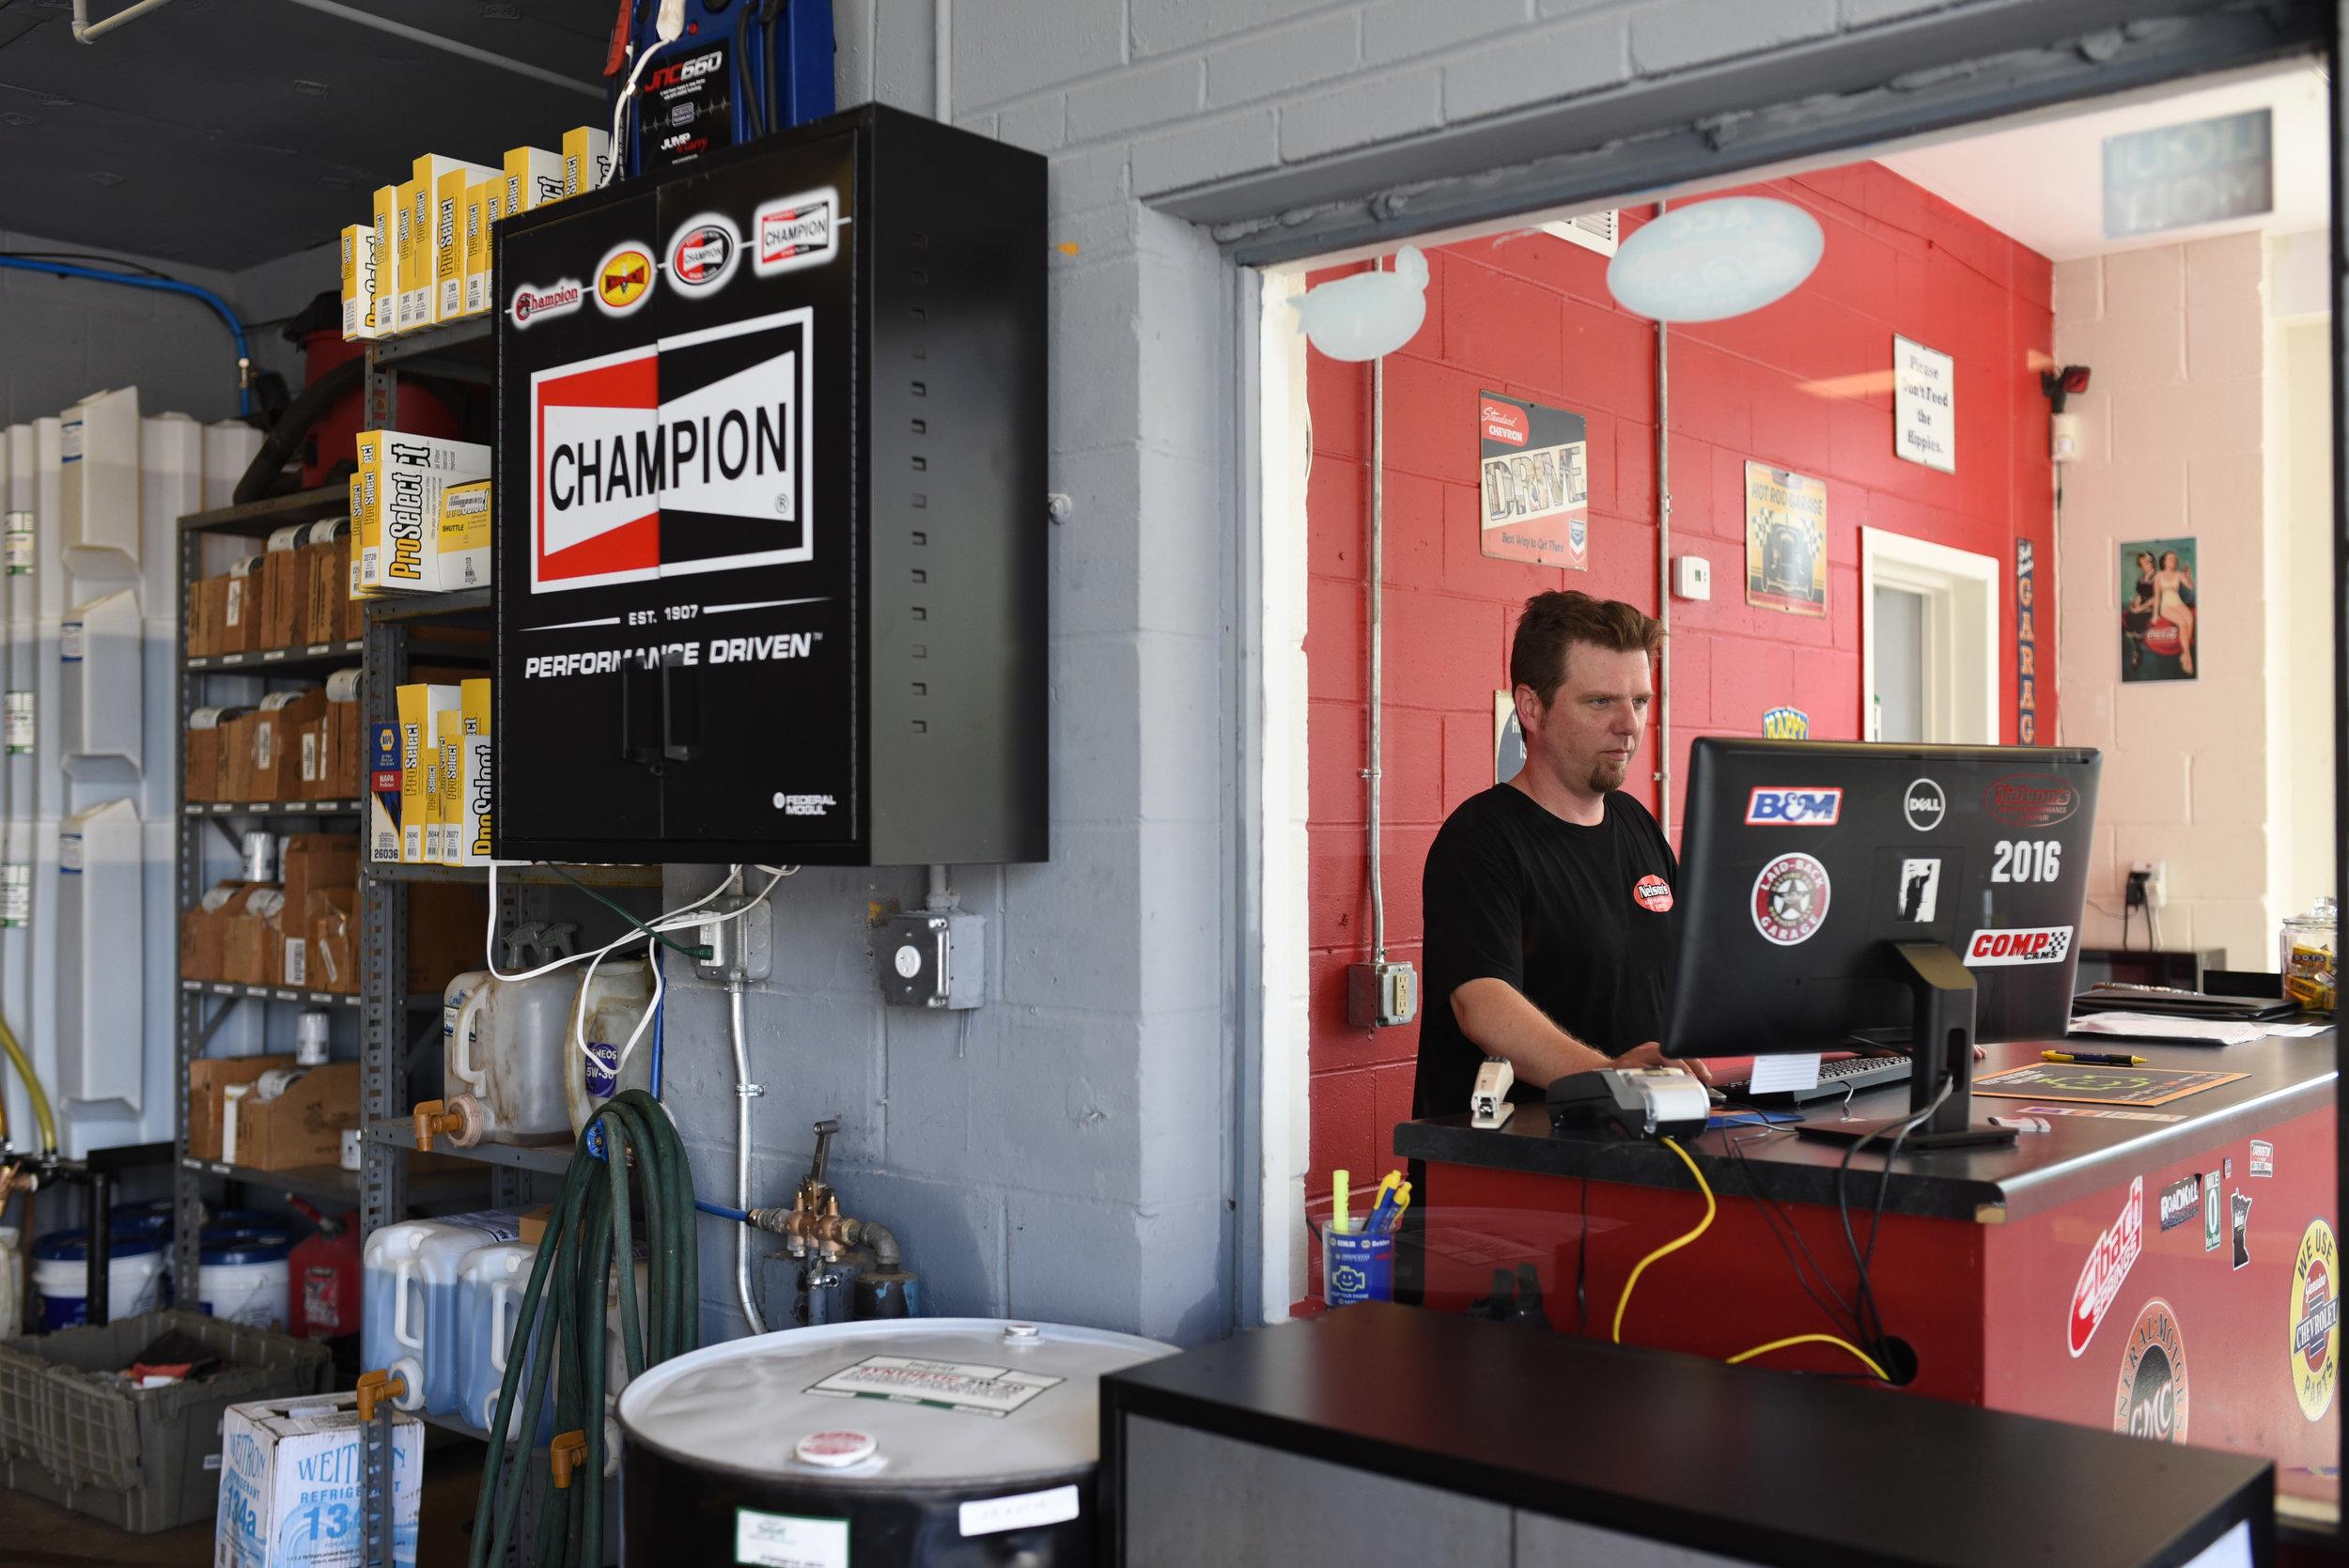 Nelson's auto repair shop in Minneapolis